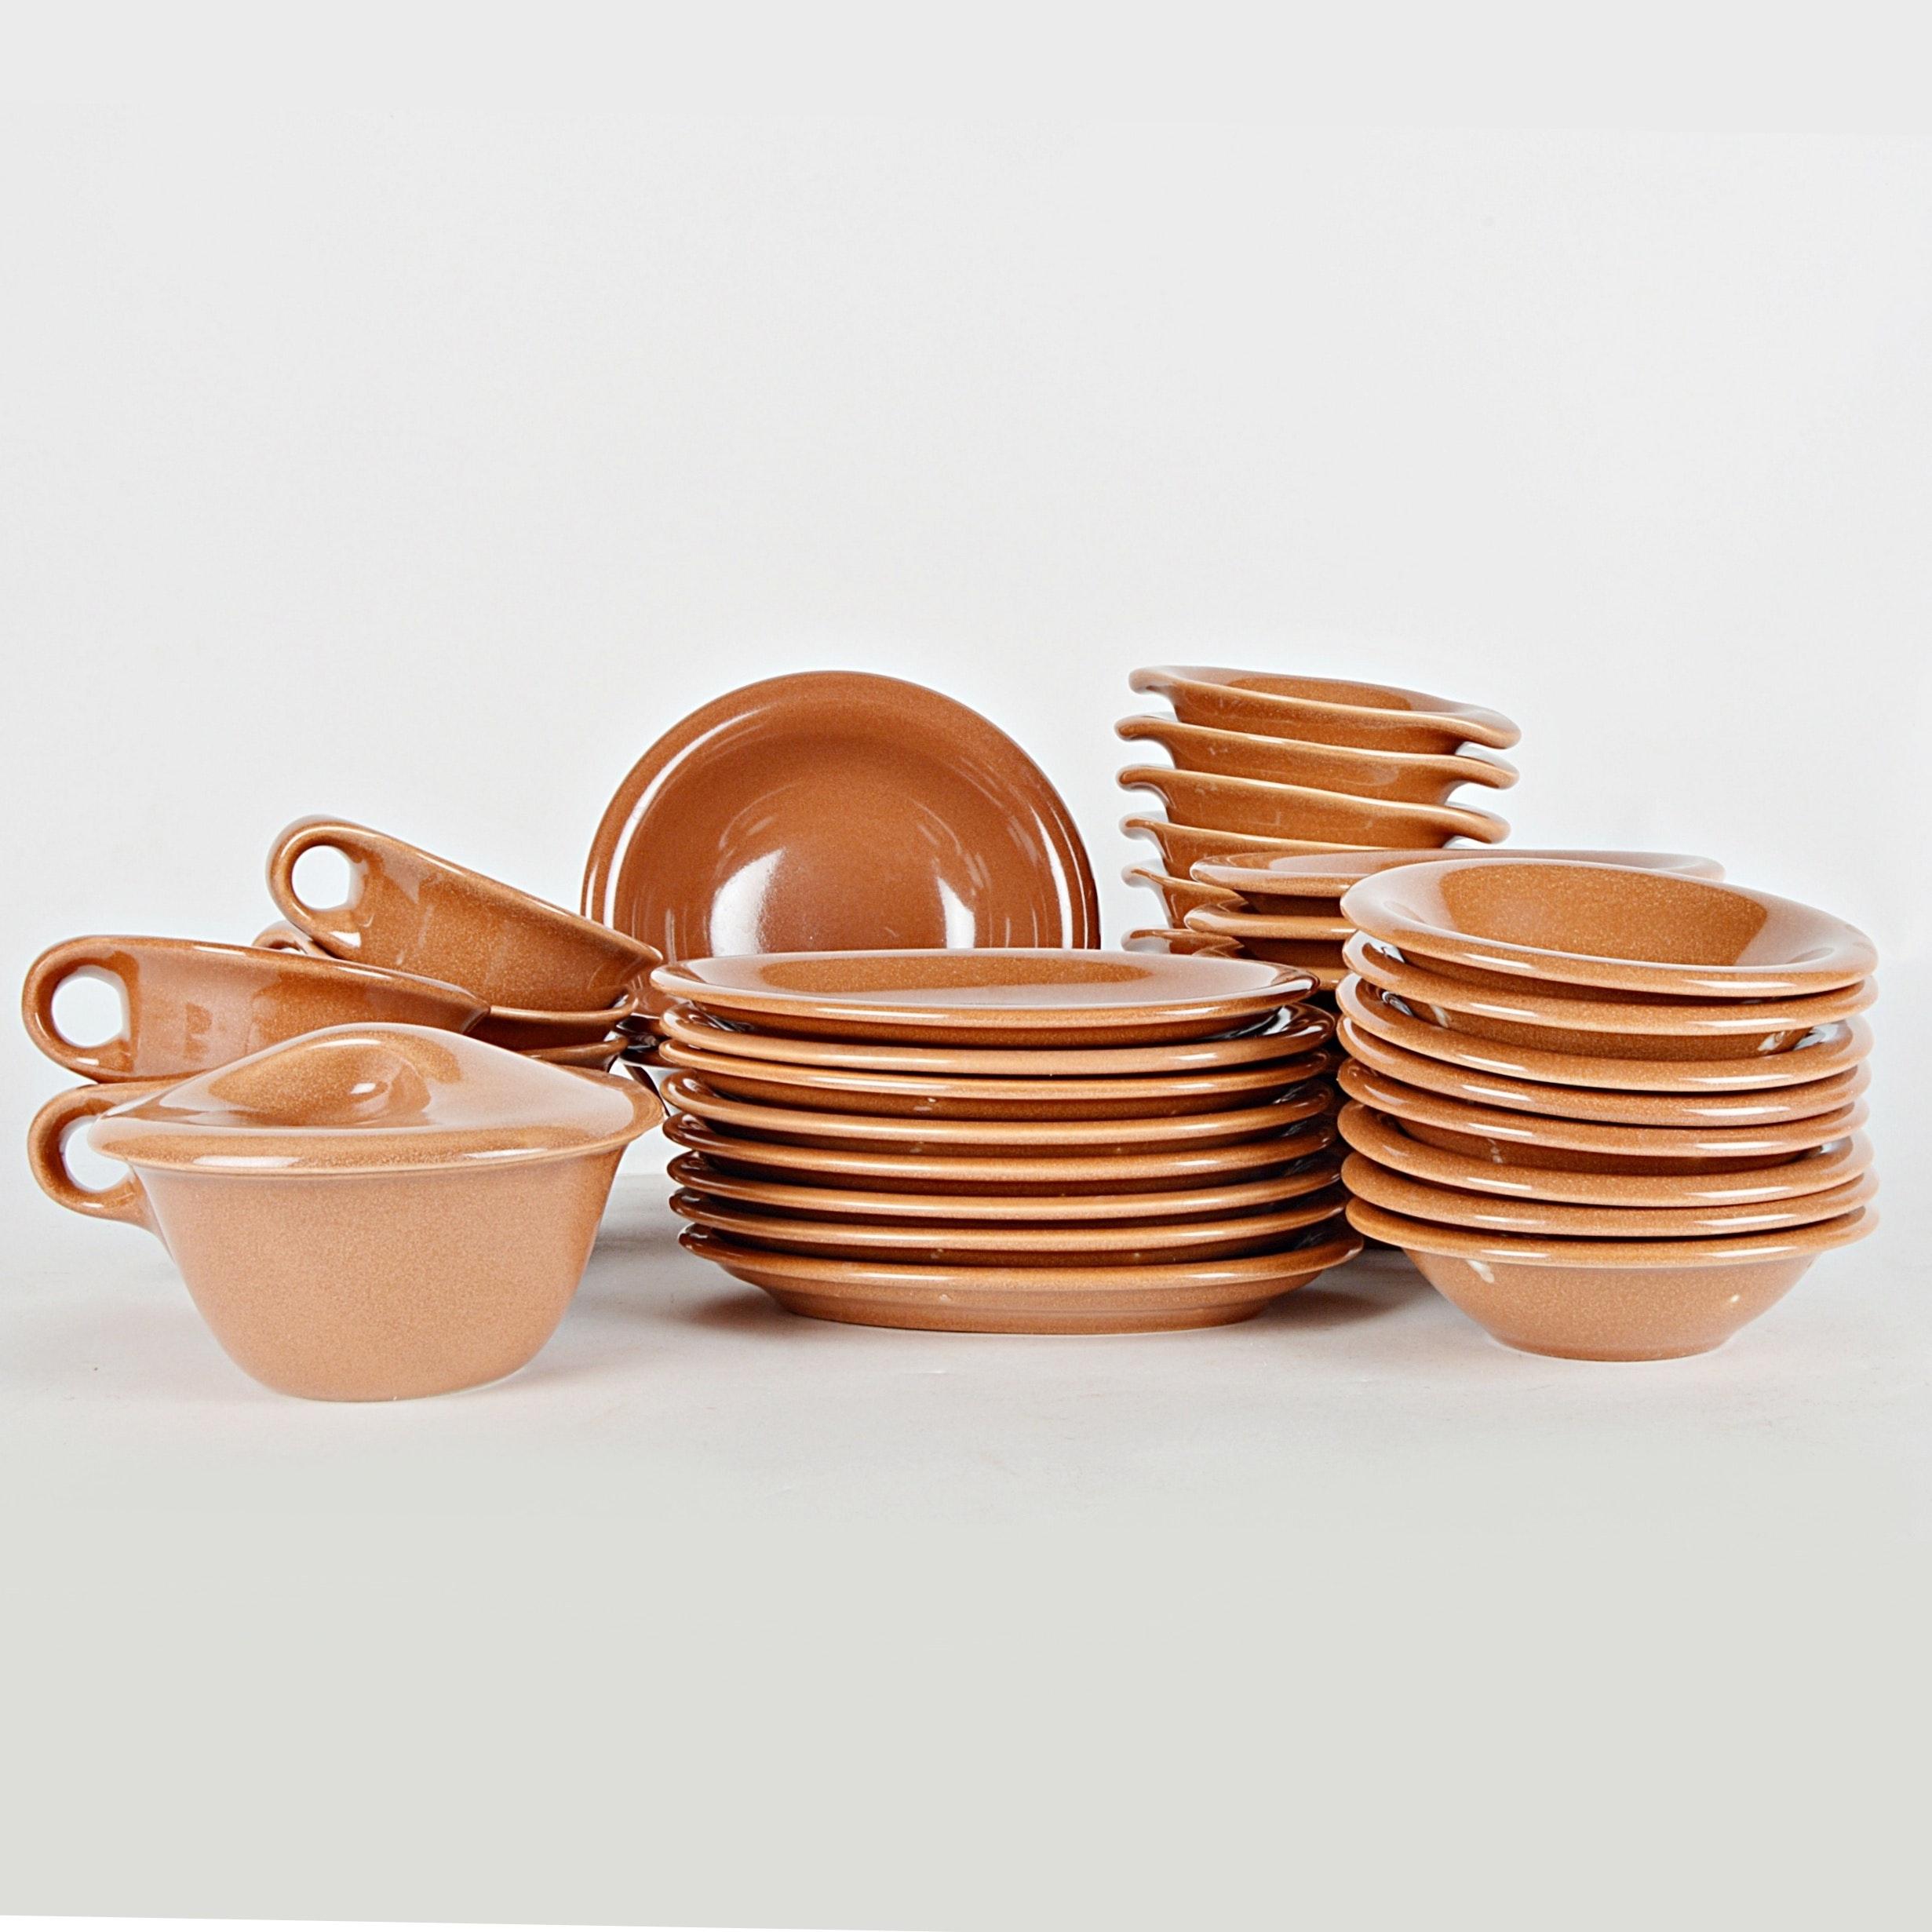 Russel Wright Dinnerware; 1x1 ... & Russel Wright Dinnerware : EBTH